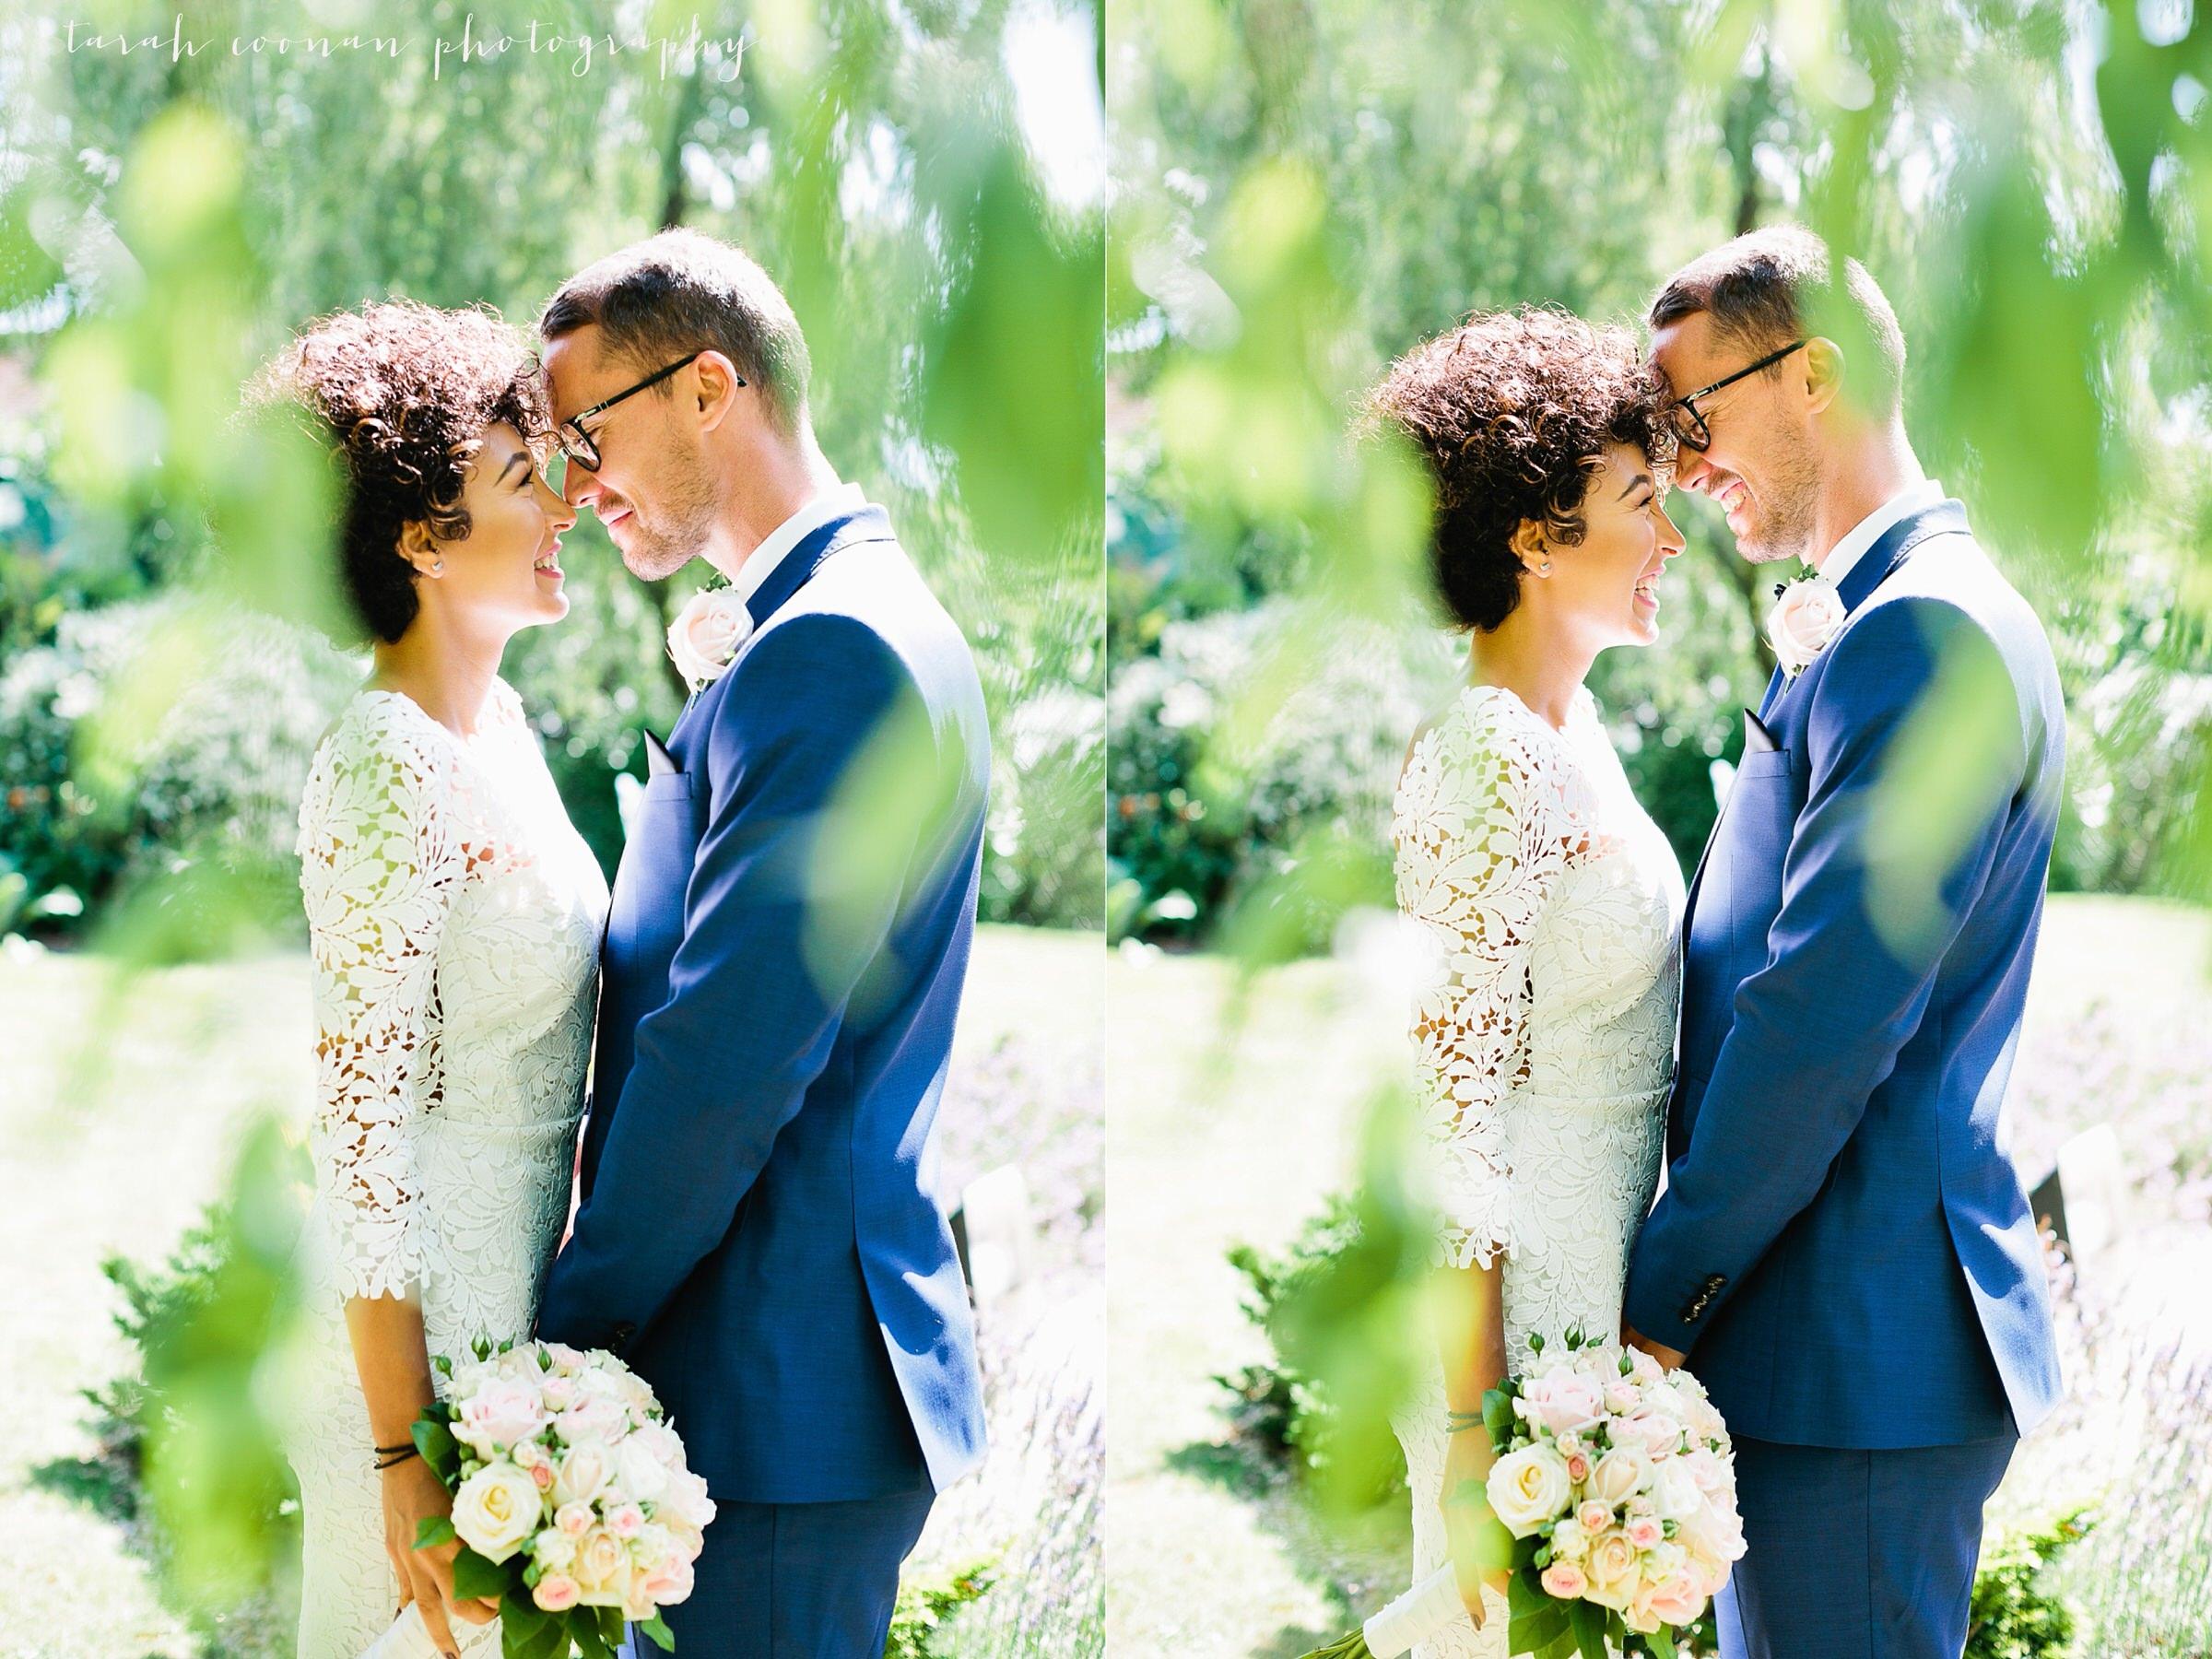 weeping willow wedding